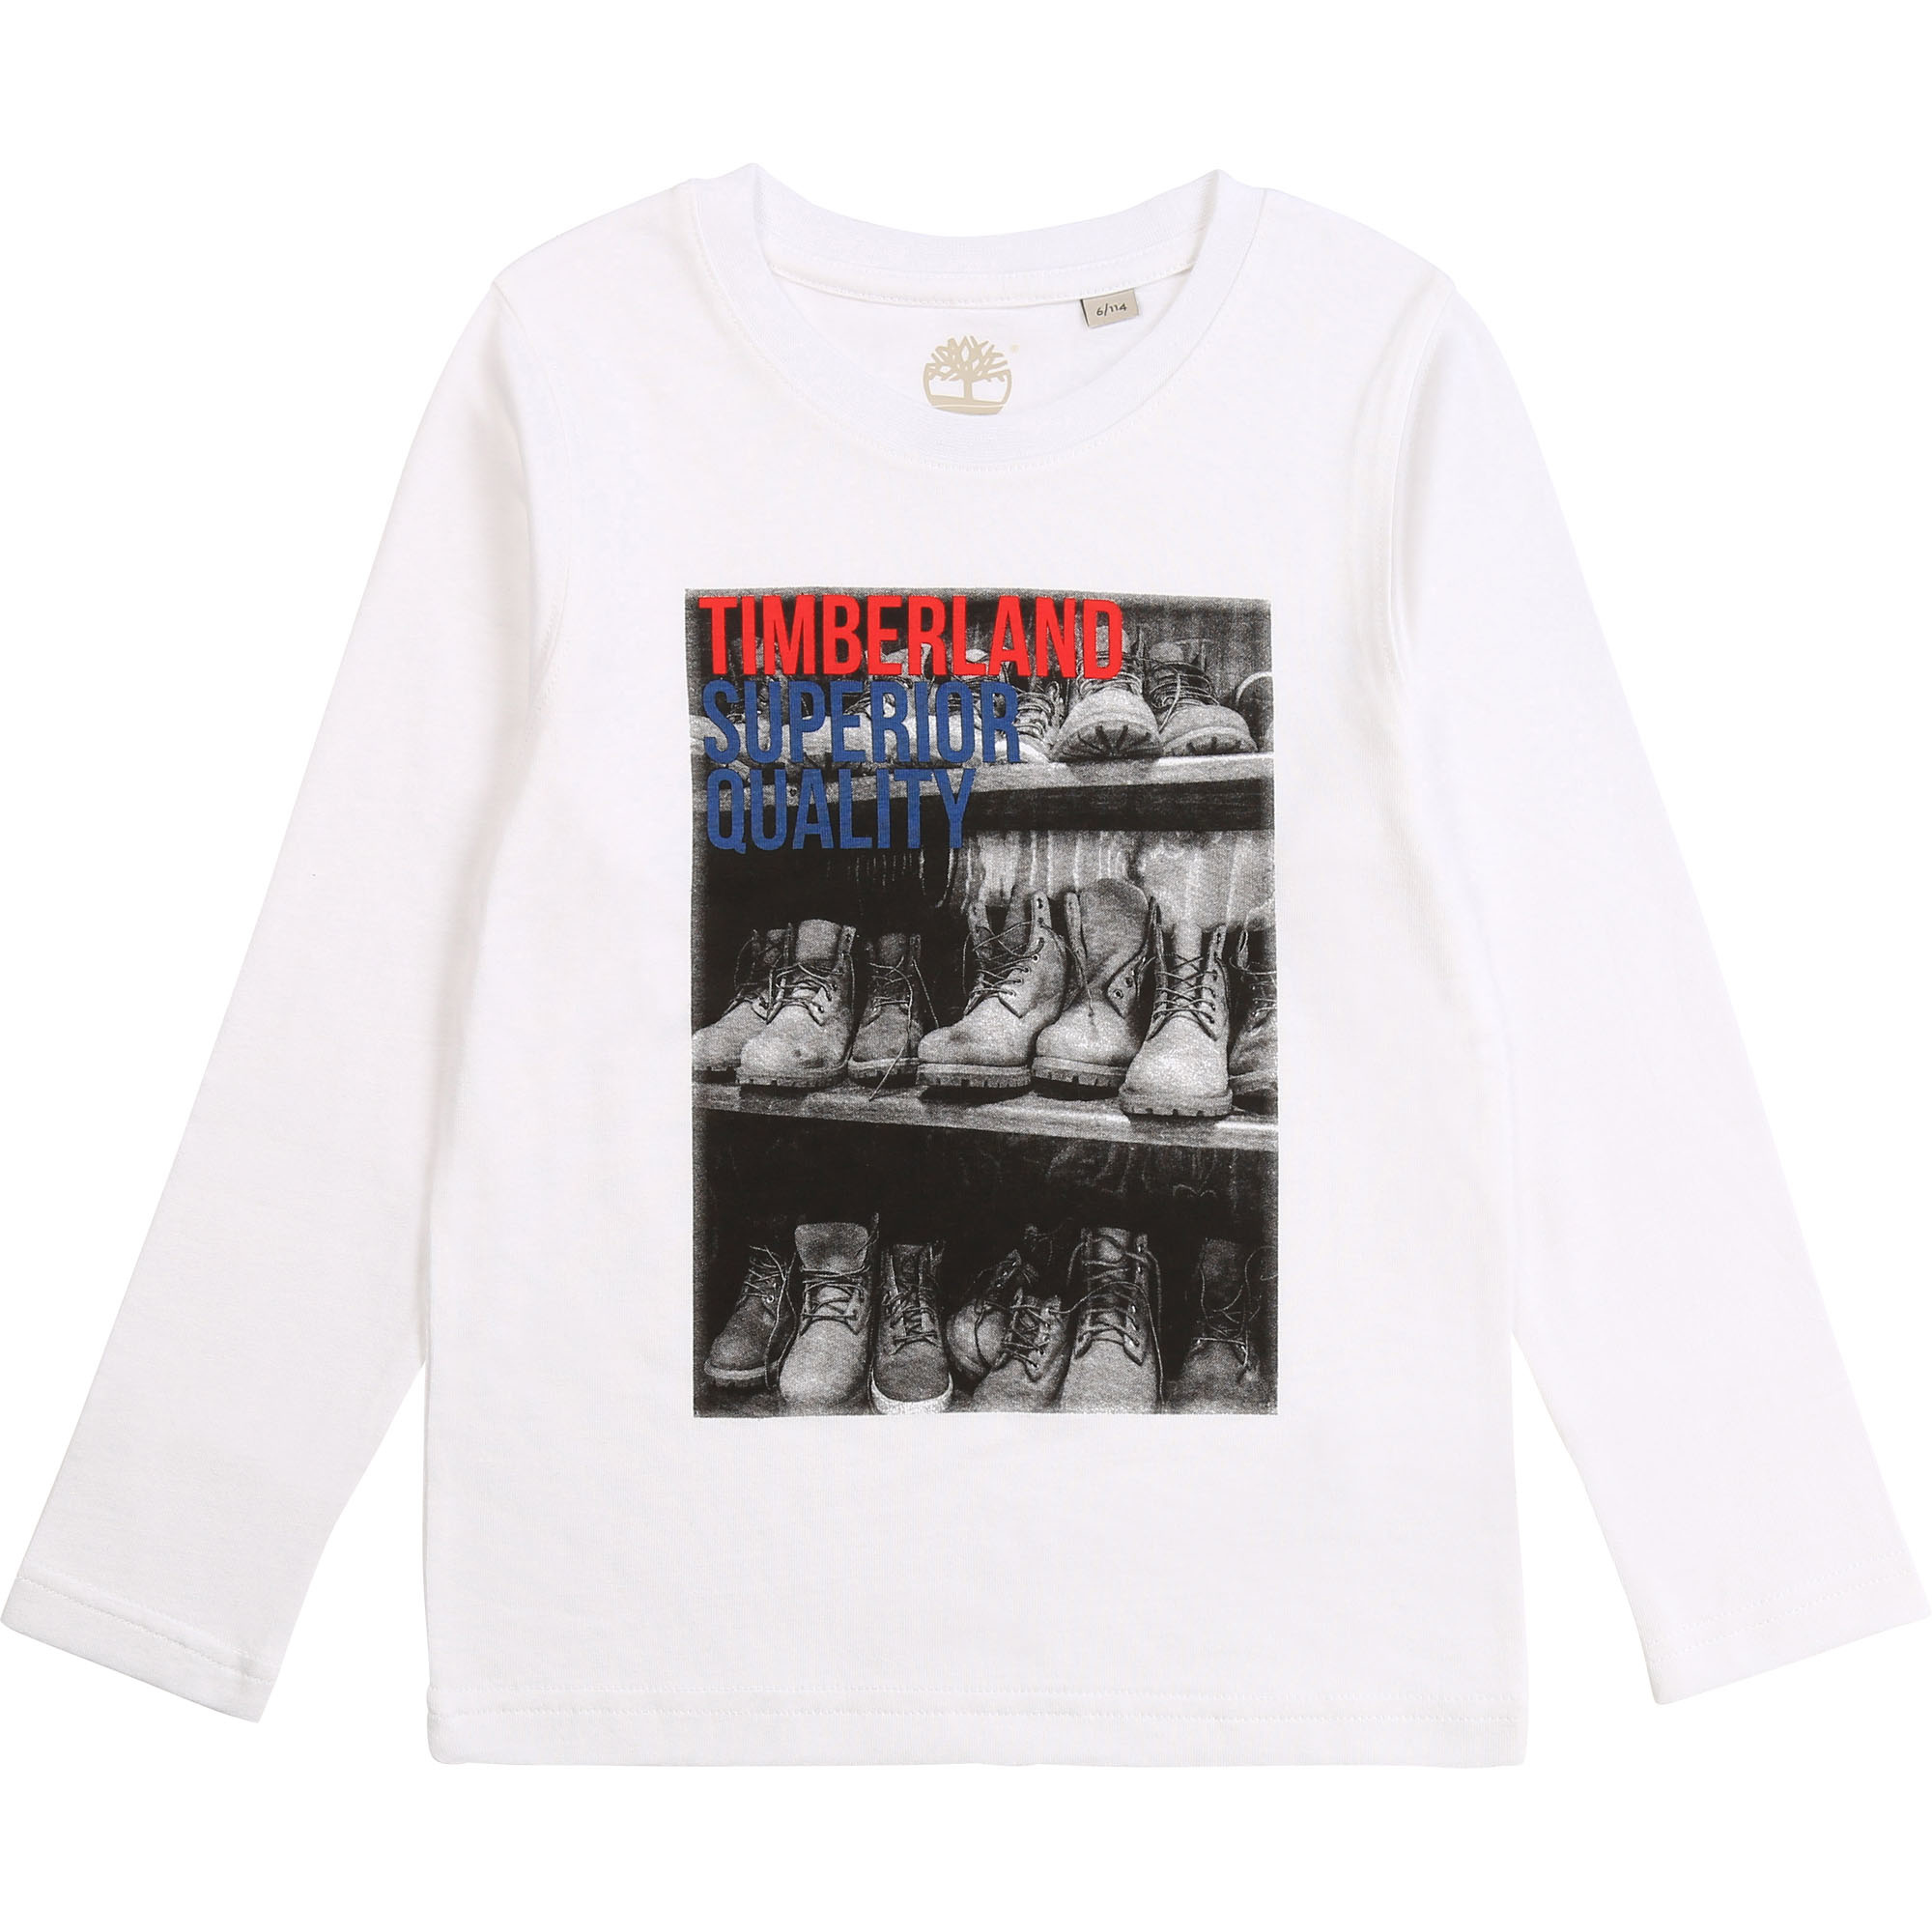 TIMBERLAND t-shirt en coton biologique-3